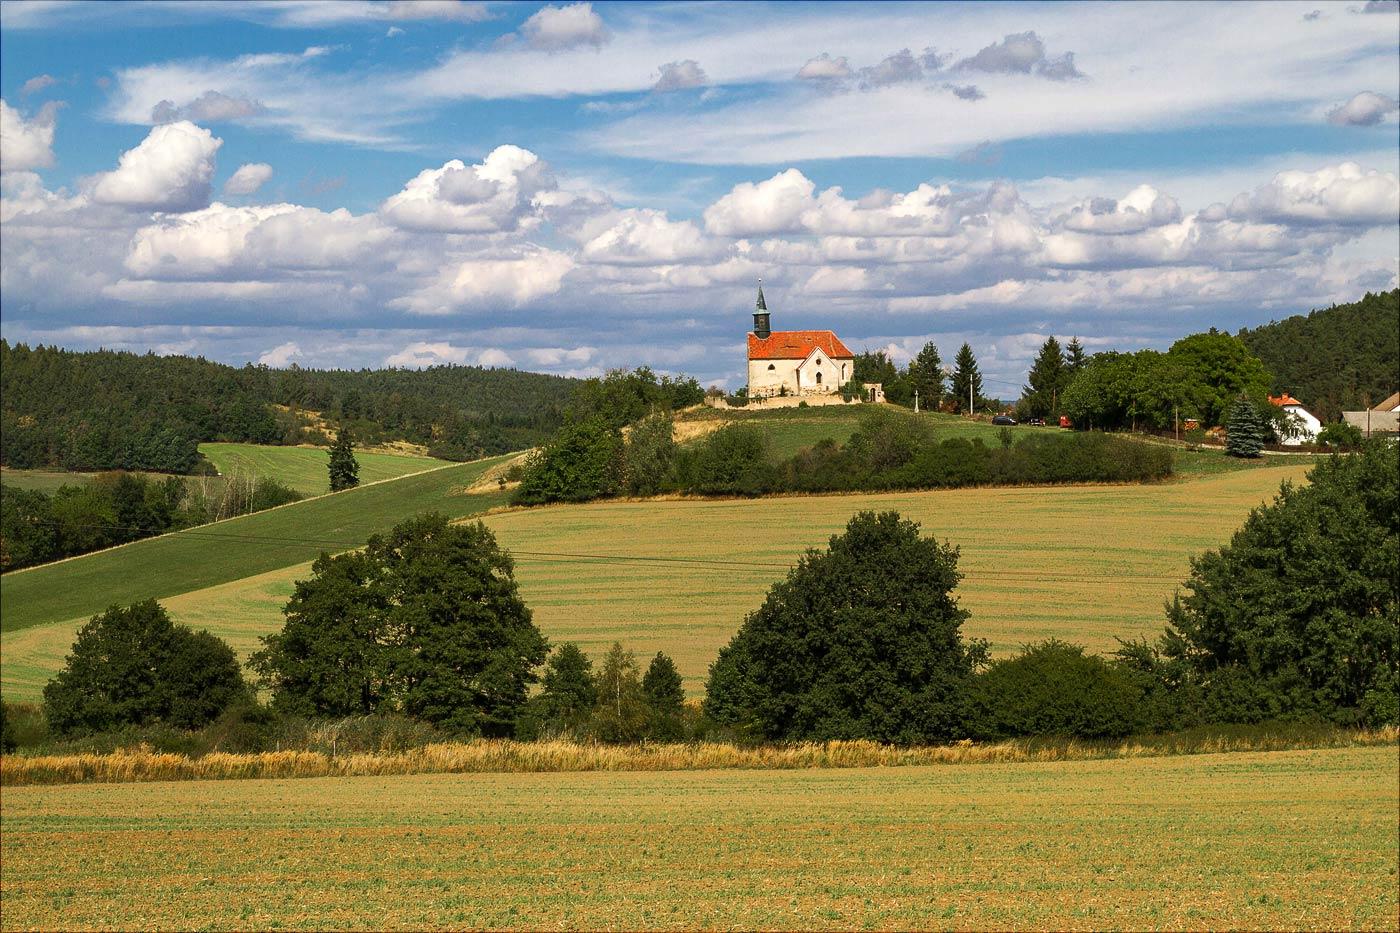 http://countryczech.com/wp-content/uploads/2016/09/photos/20150905-135159_Benesov_okoli.jpg